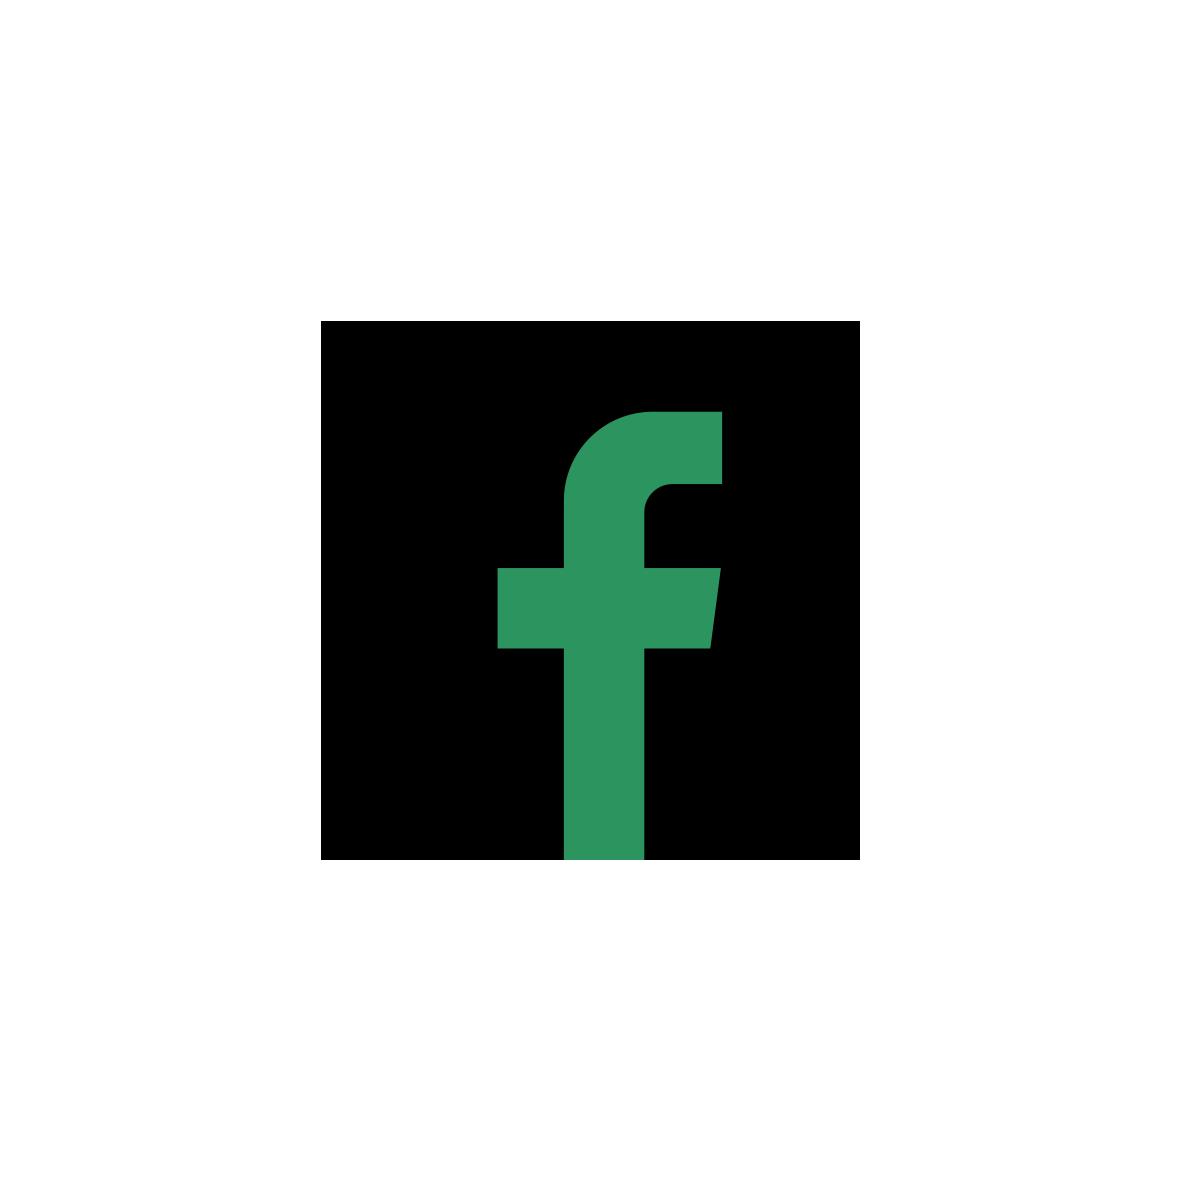 fb_green_02